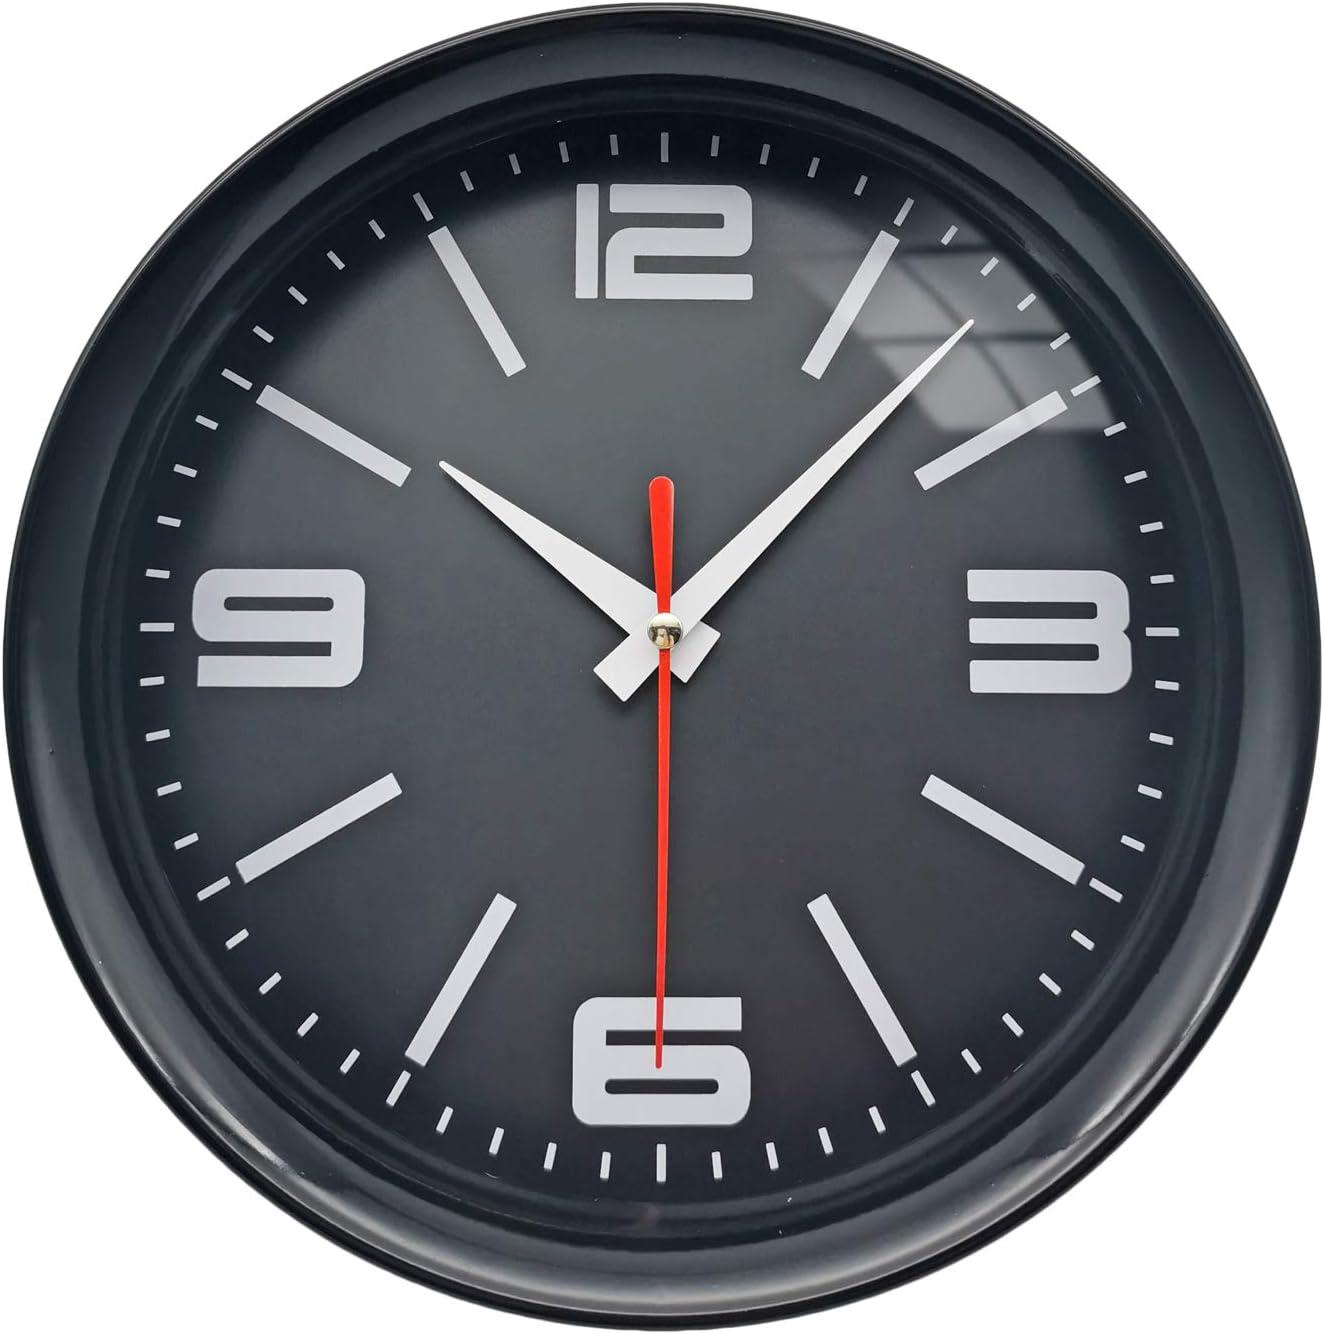 OuYun Small Black Wall Clock Battery Operated 8